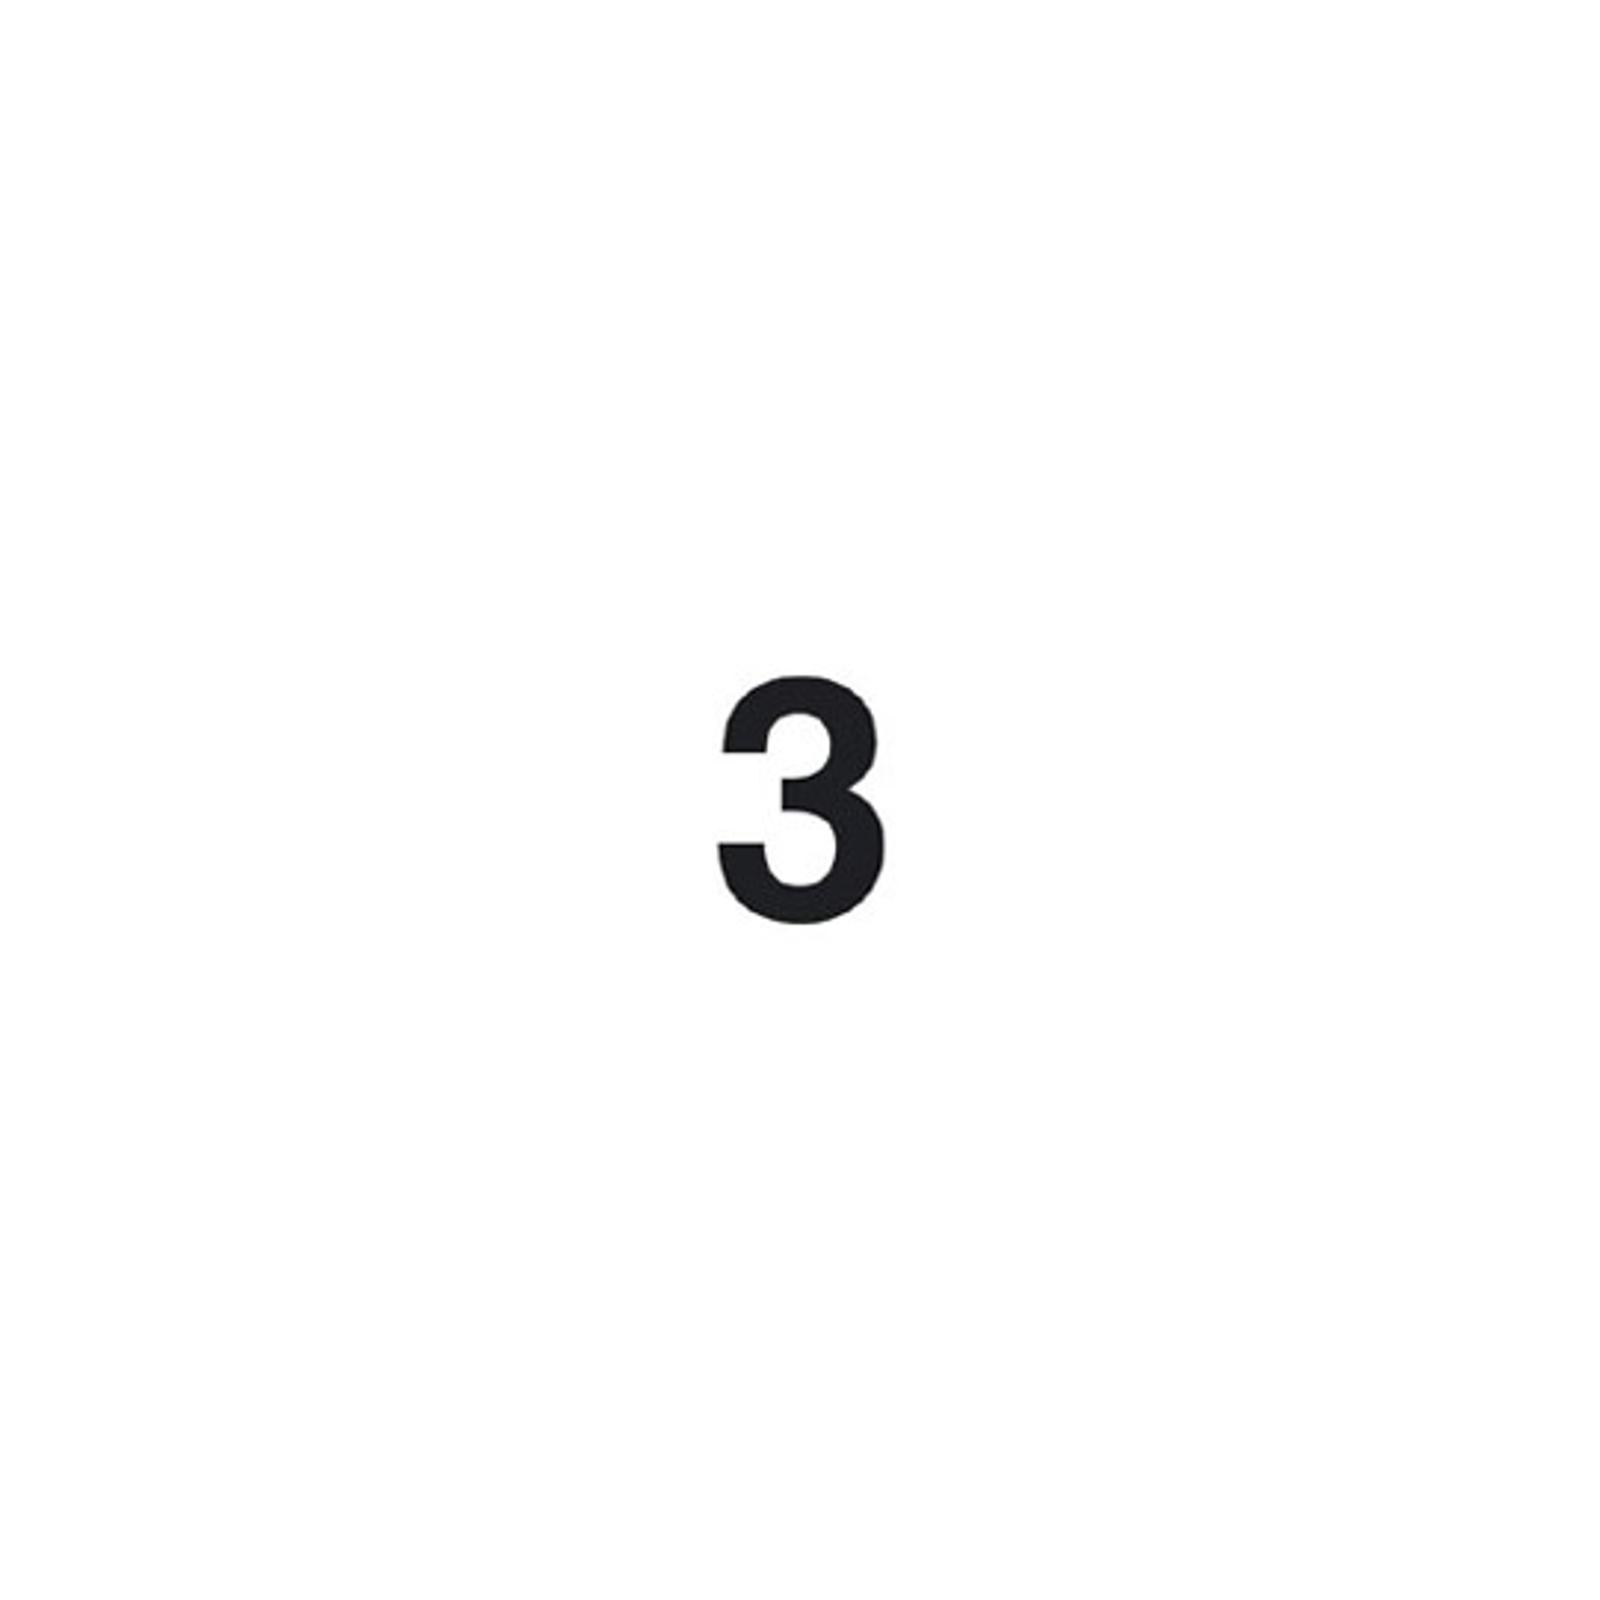 Selbstklebende Ziffer 3